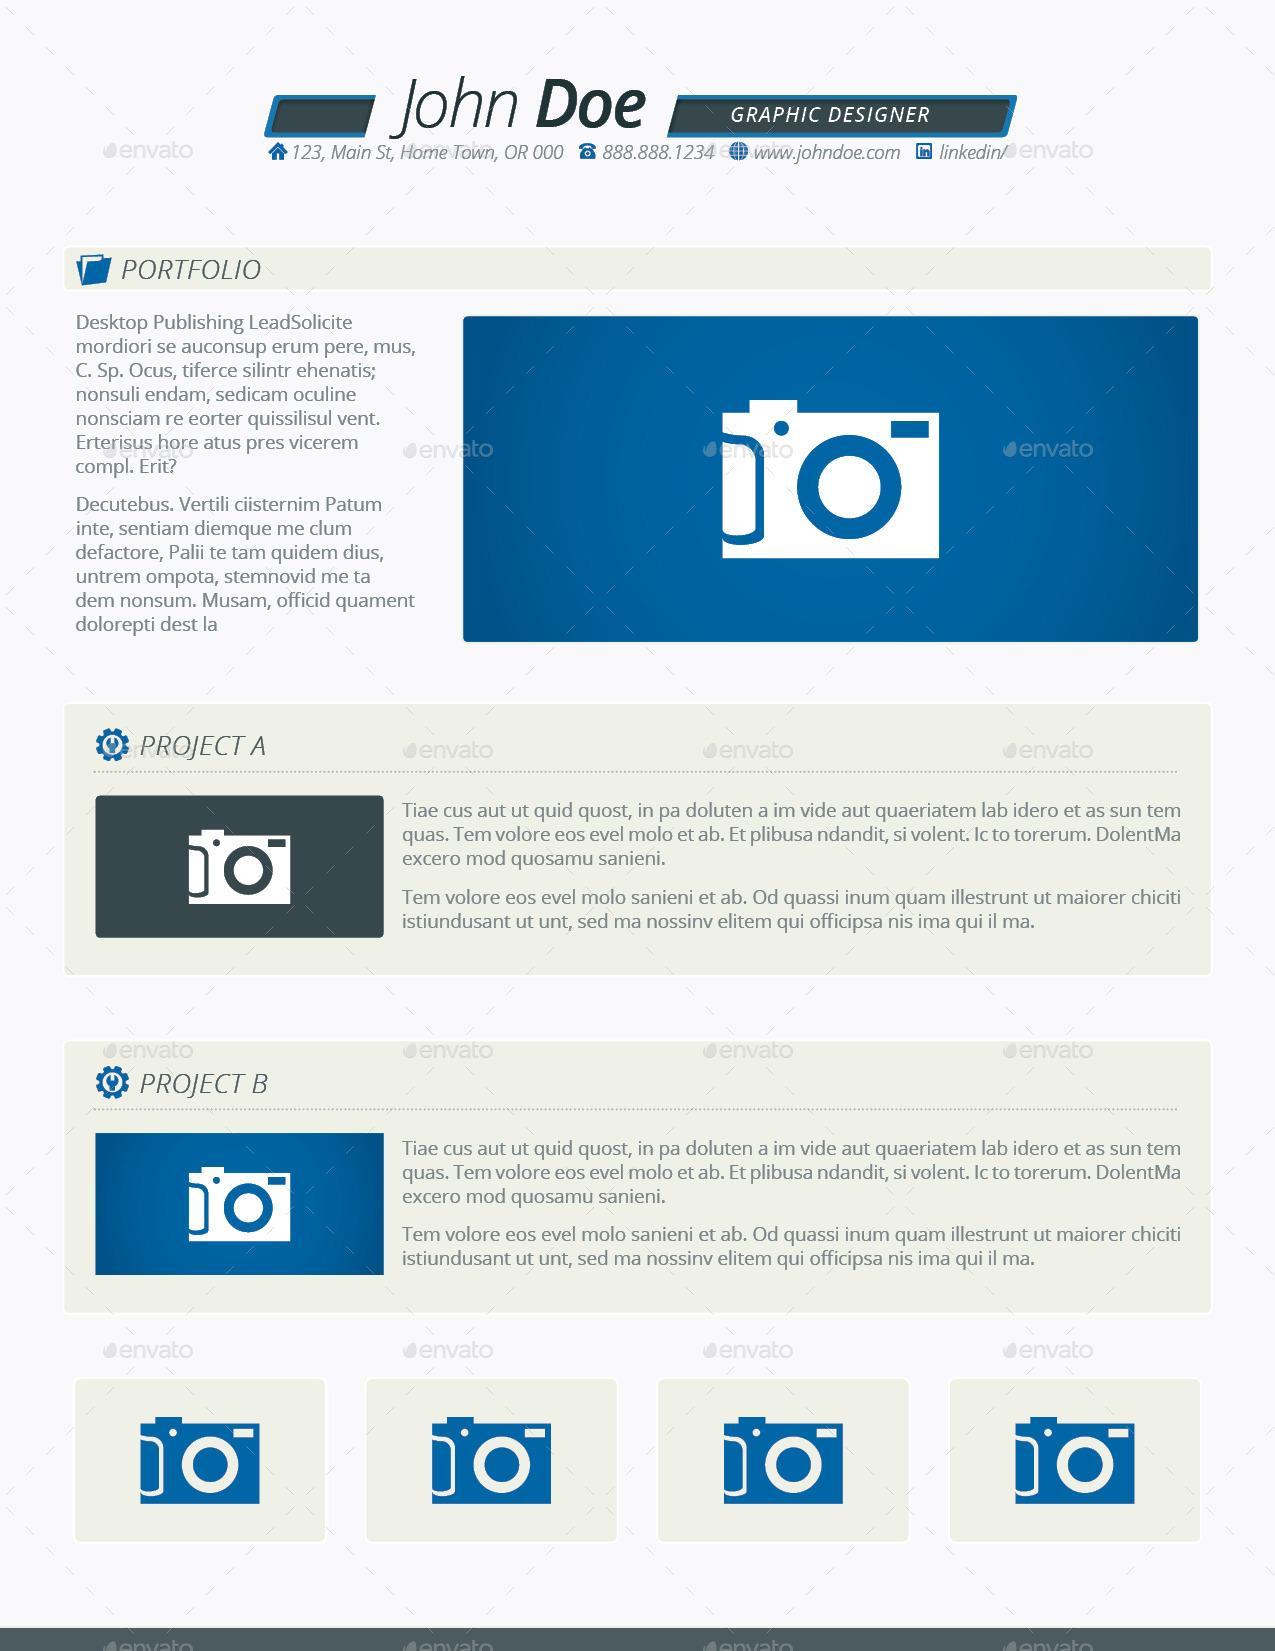 preview image setletter trueb resume template6jpg trueb preview image settrueb business card